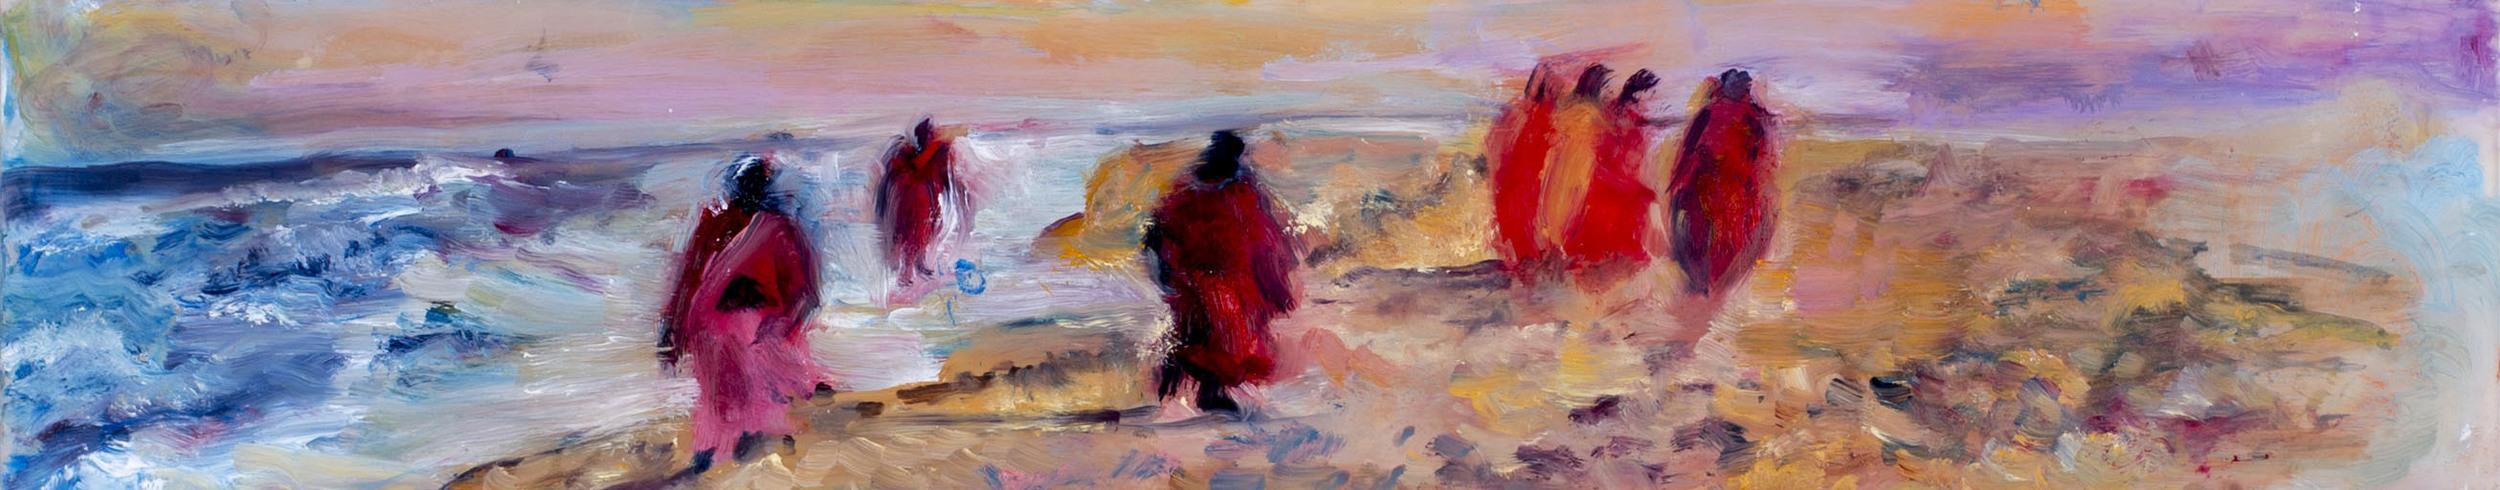 "Medium: Oil Paint on Mylar  Dimensions: 12½""x2½"""